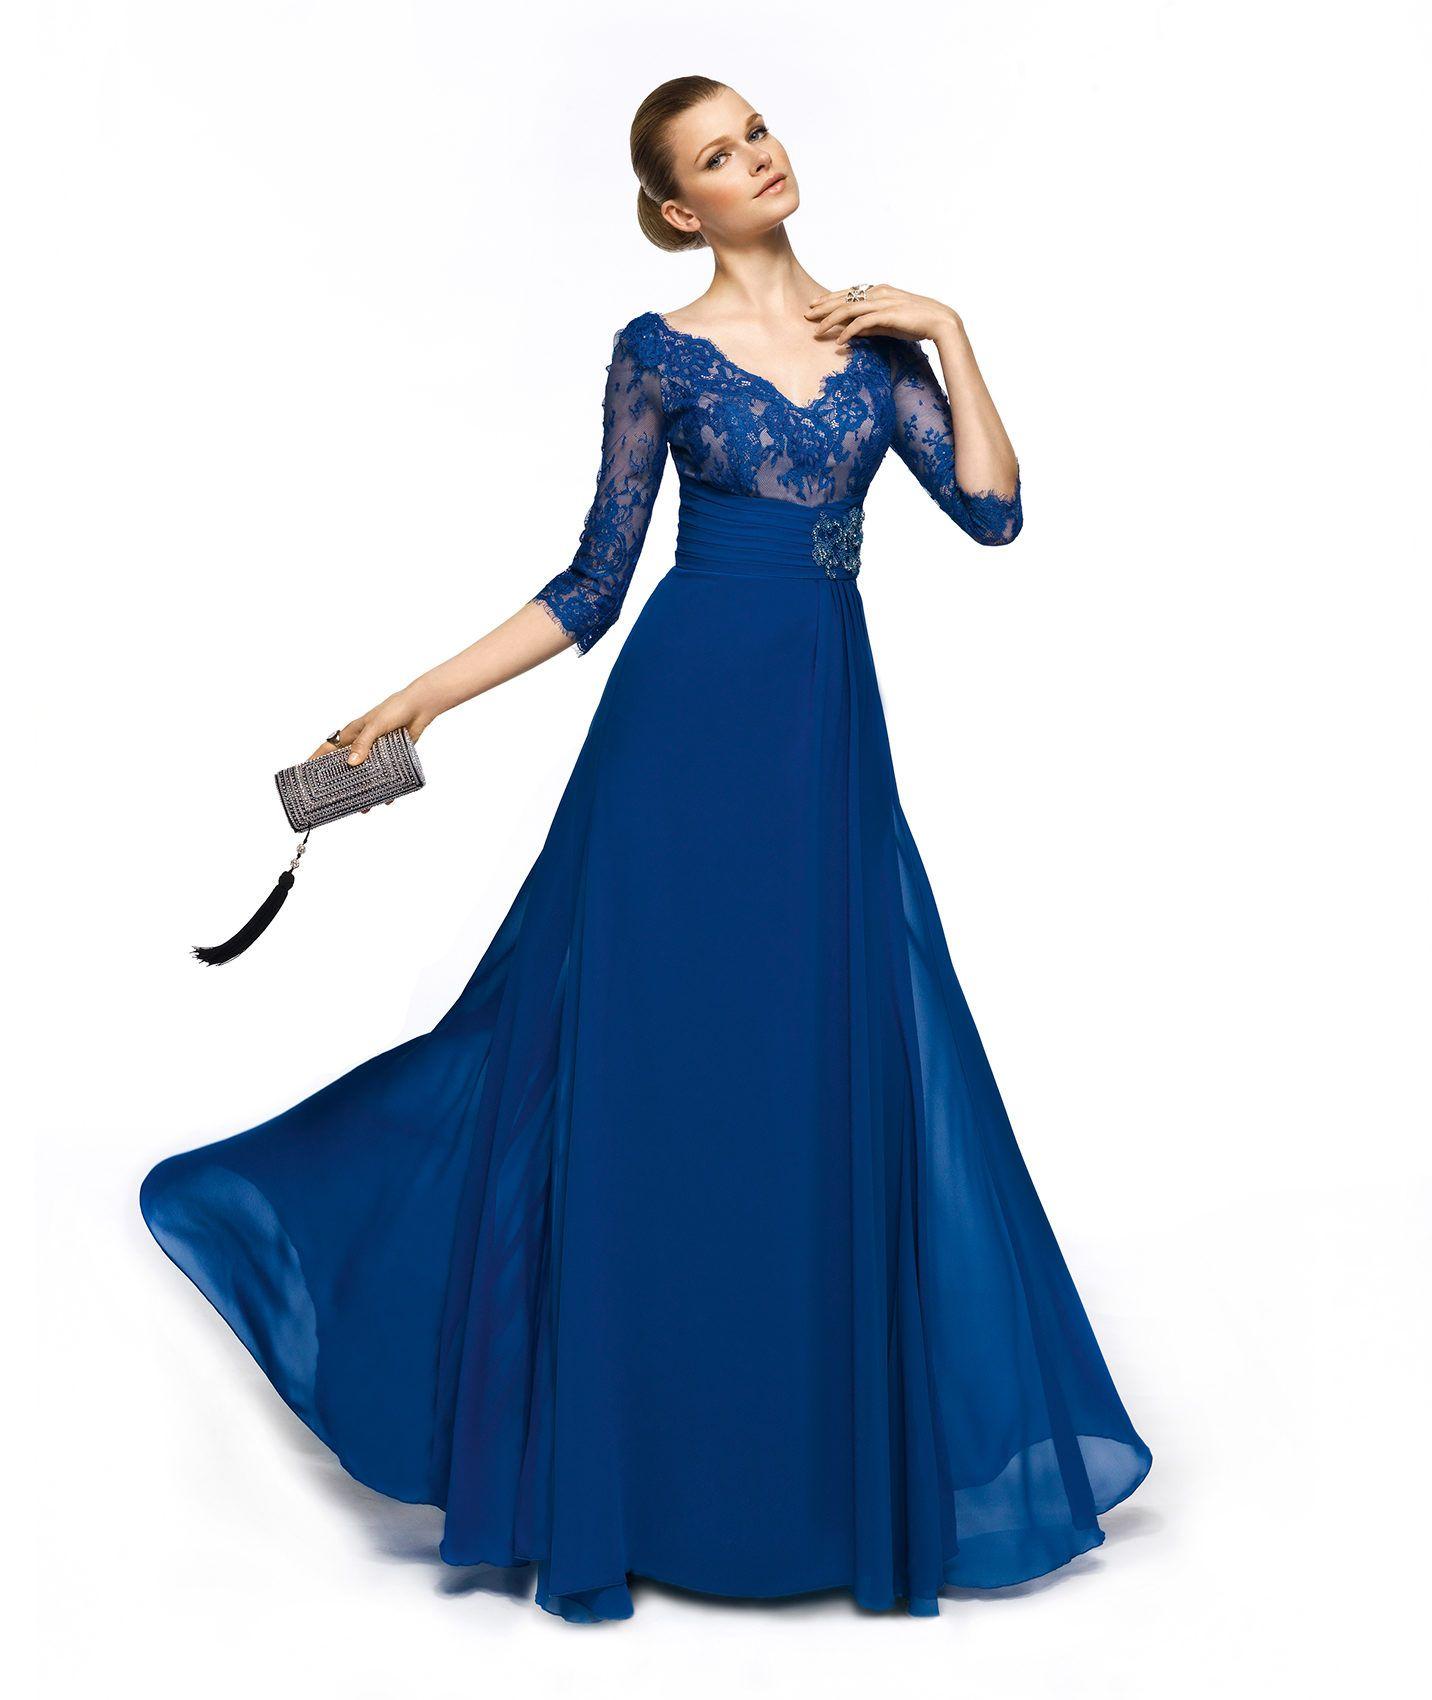 81e94395c vestidos de noche color azul rey - Buscar con Google